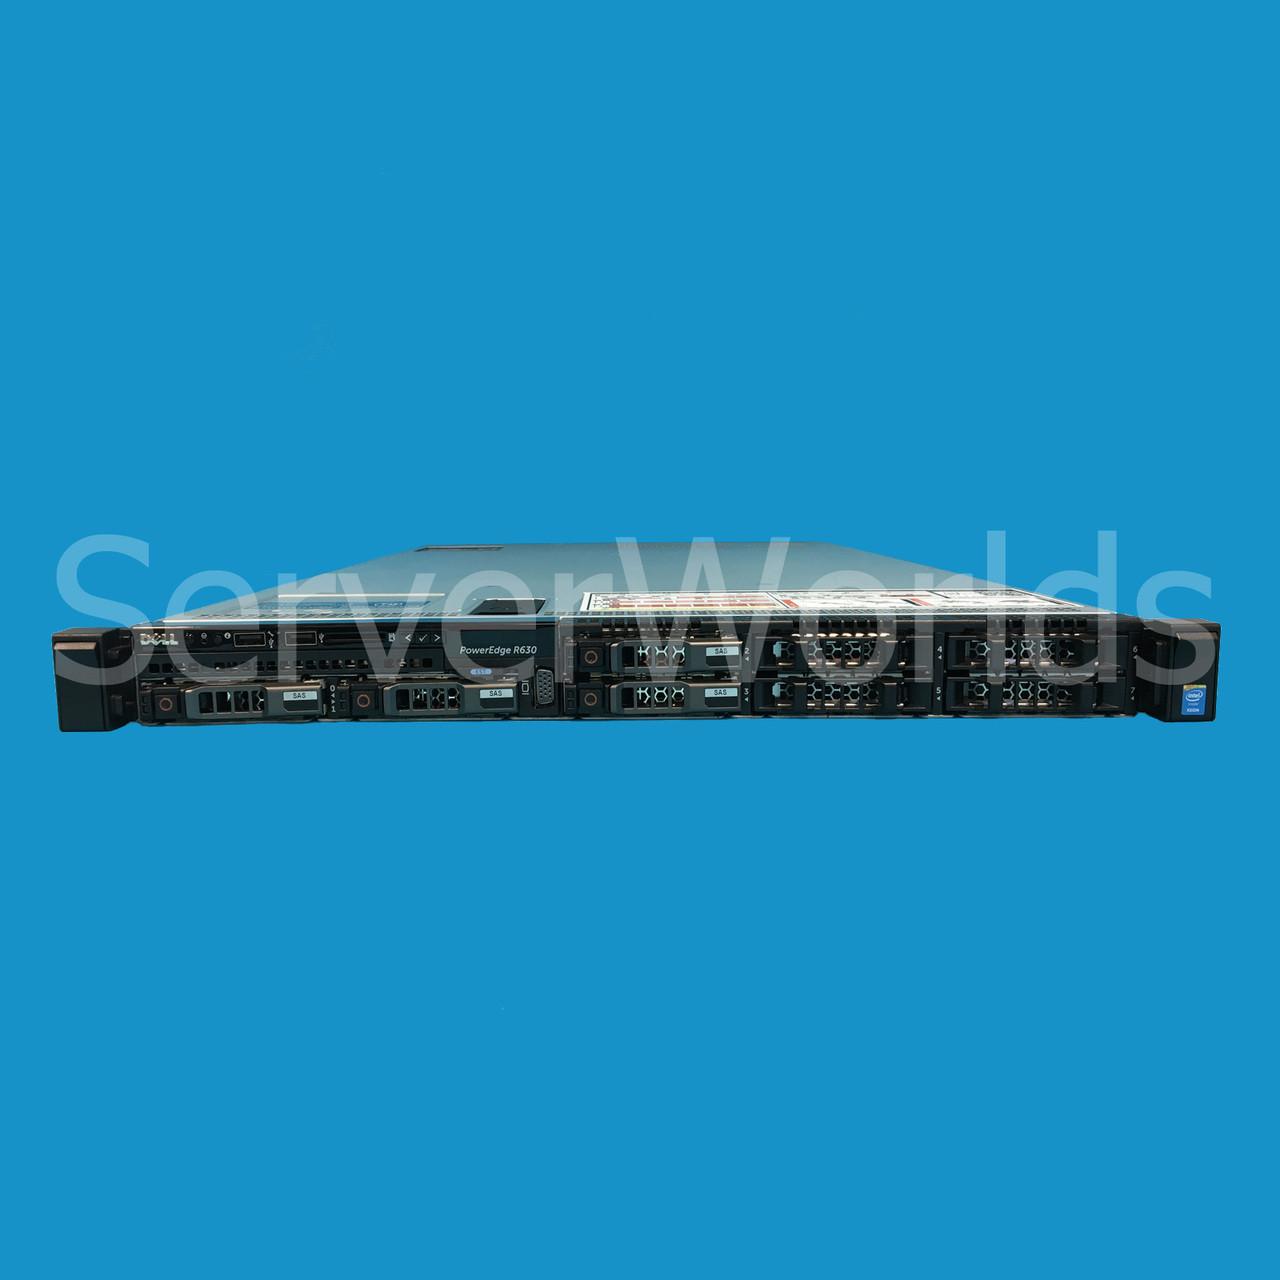 Refurbished Poweredge R630 | Used Poweredge R630